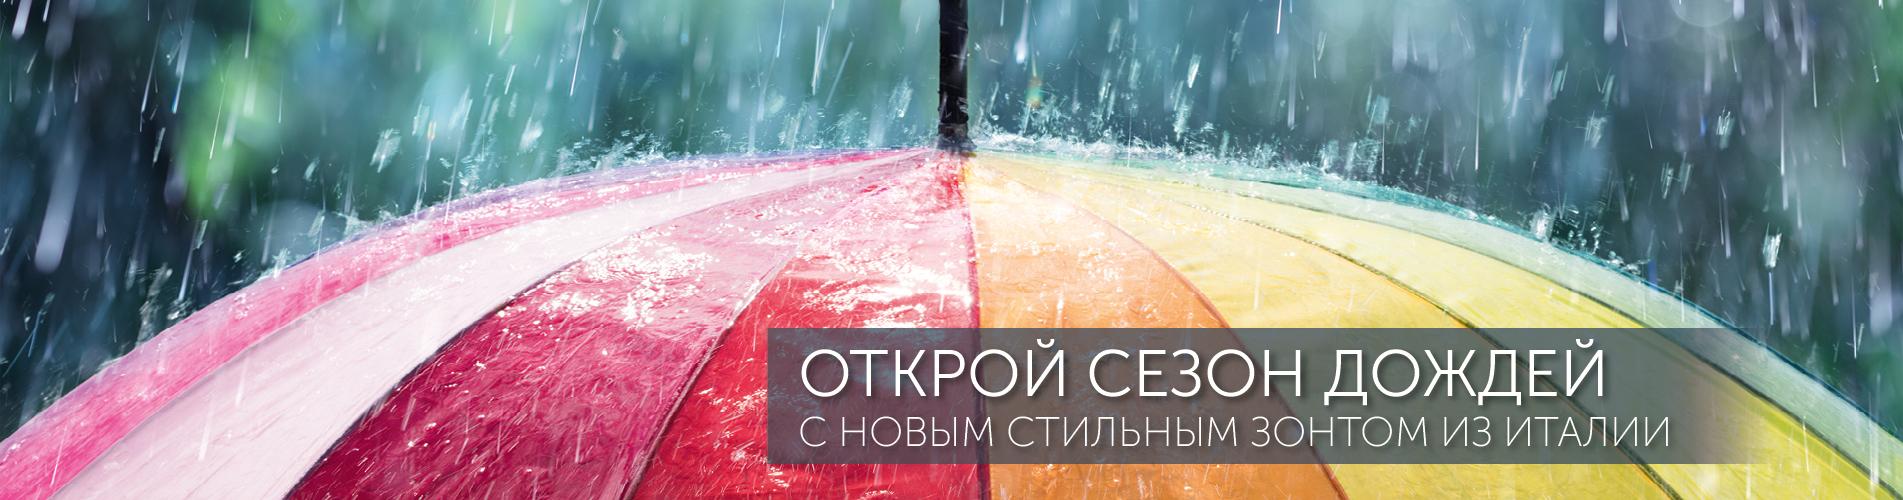 Зонты весна